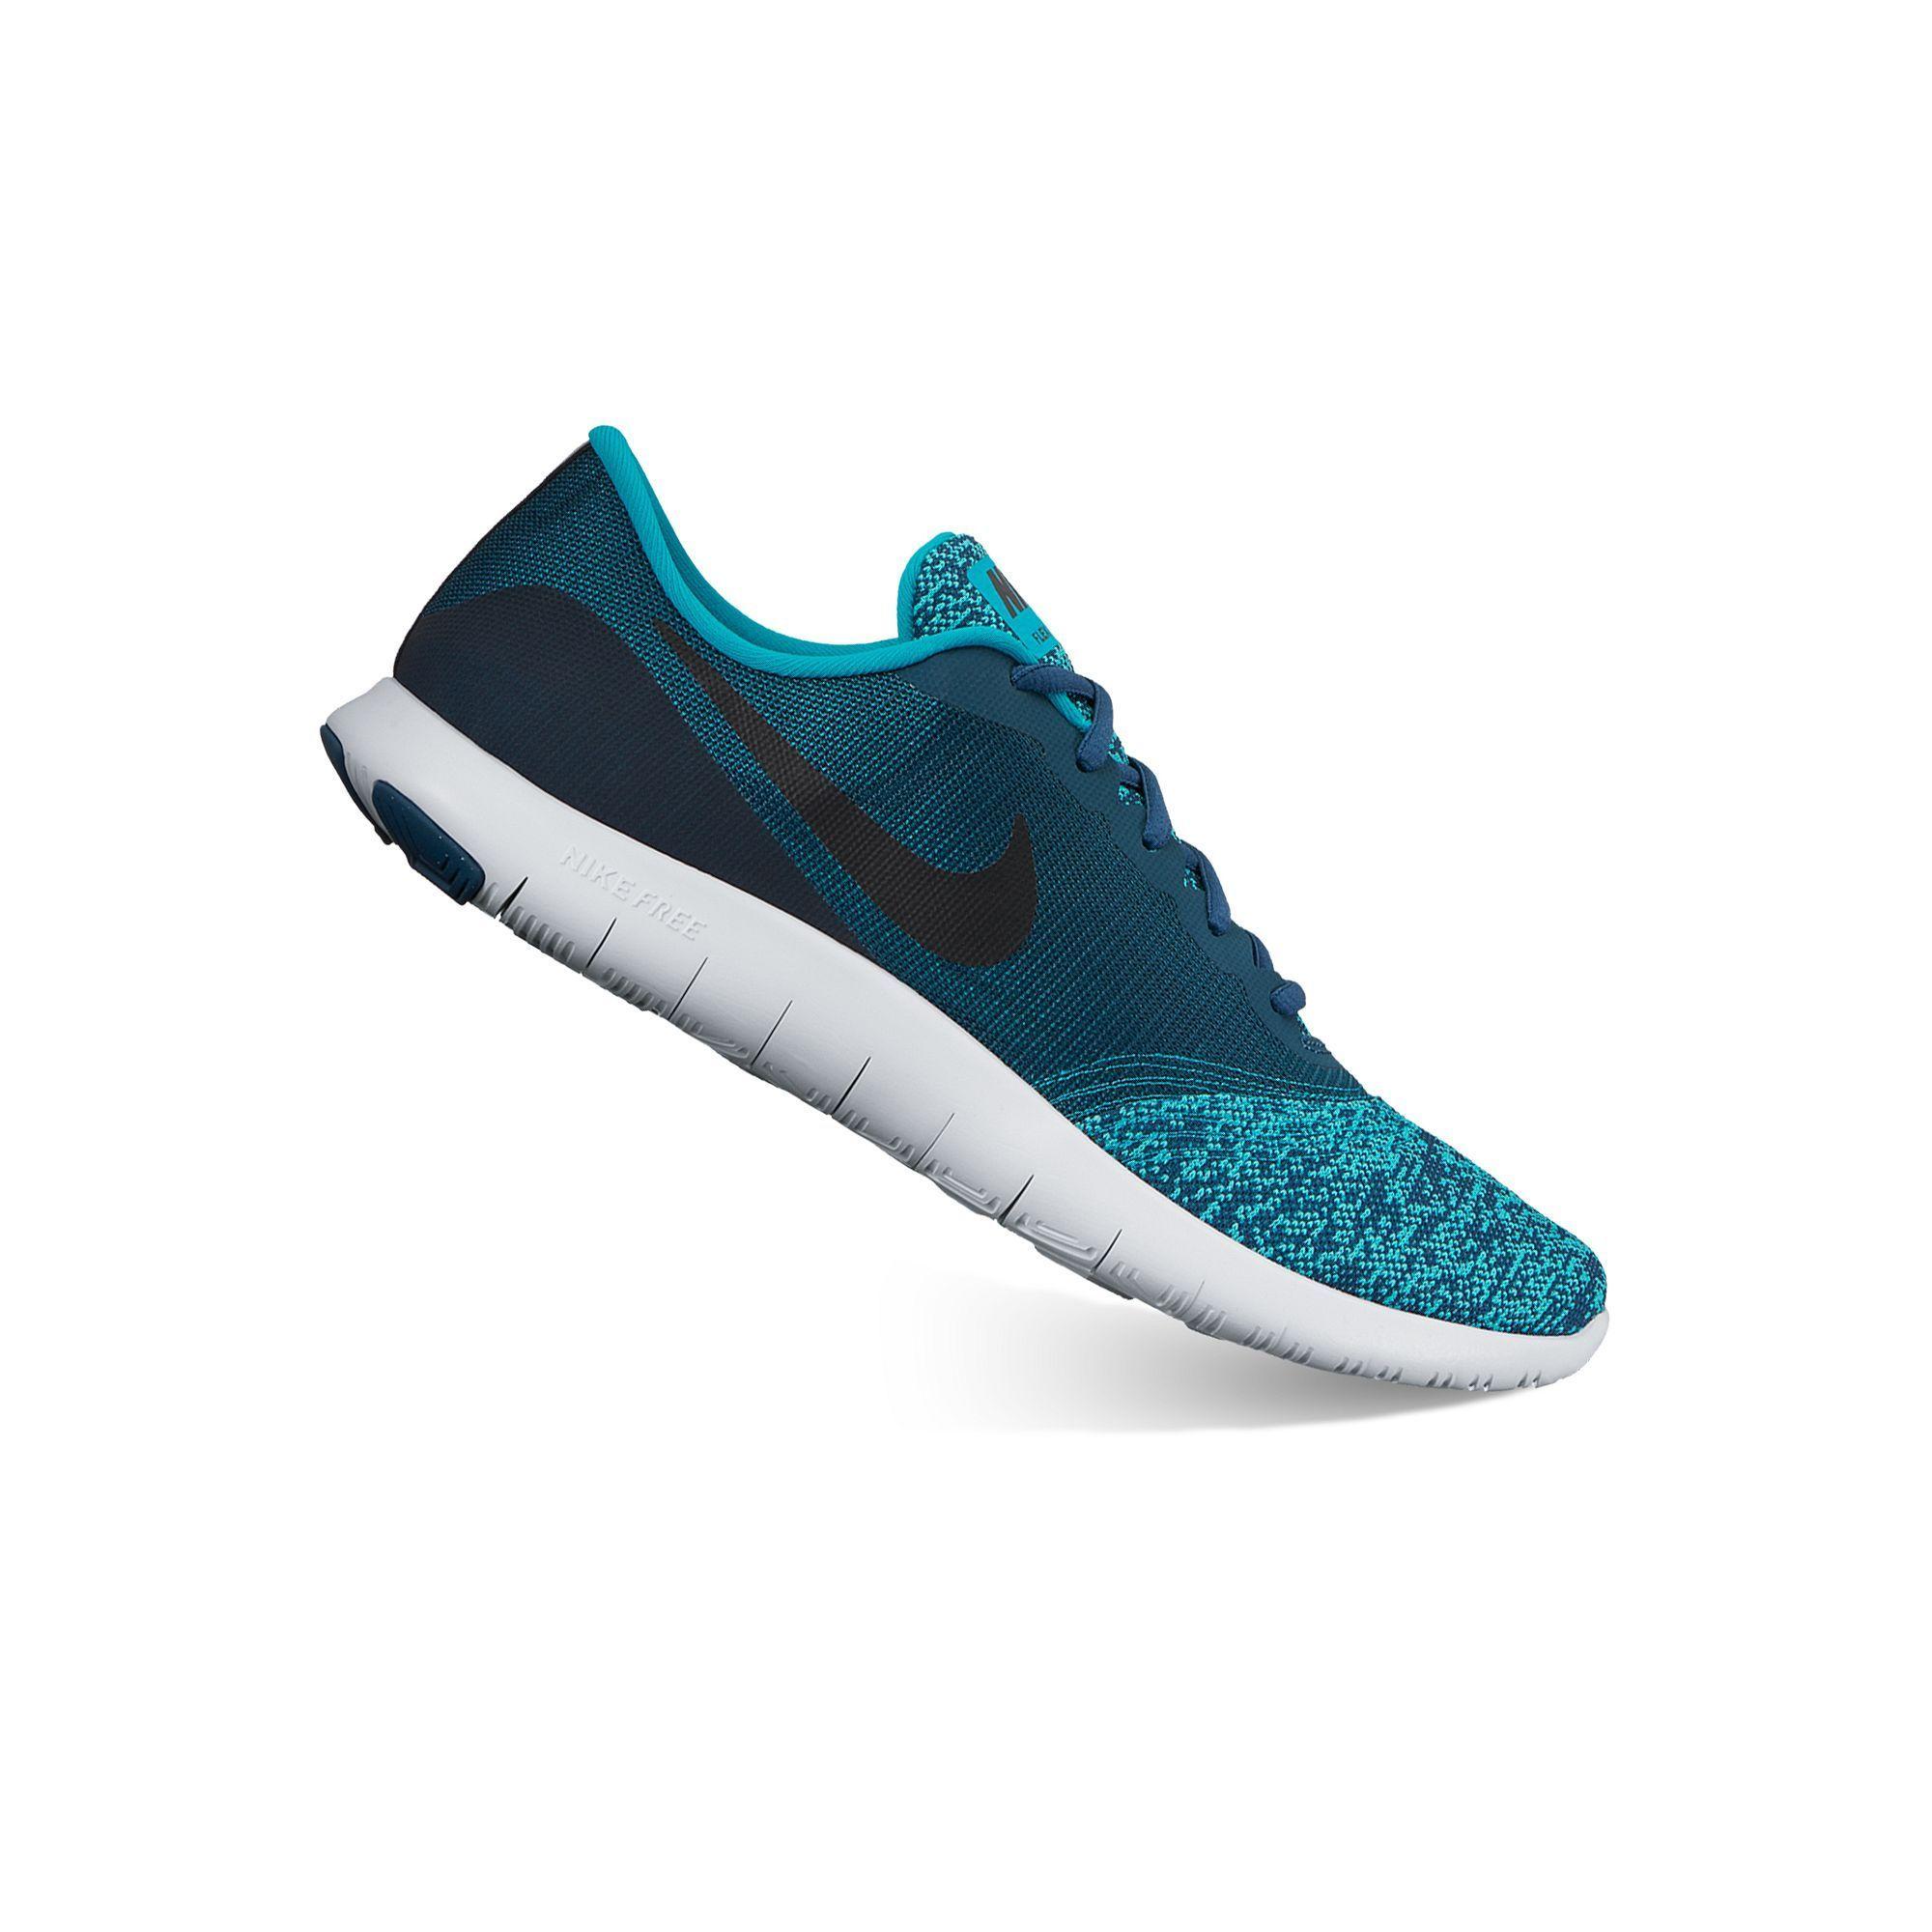 3caf3378e15 Nike Flex Contact Men s Running Shoes